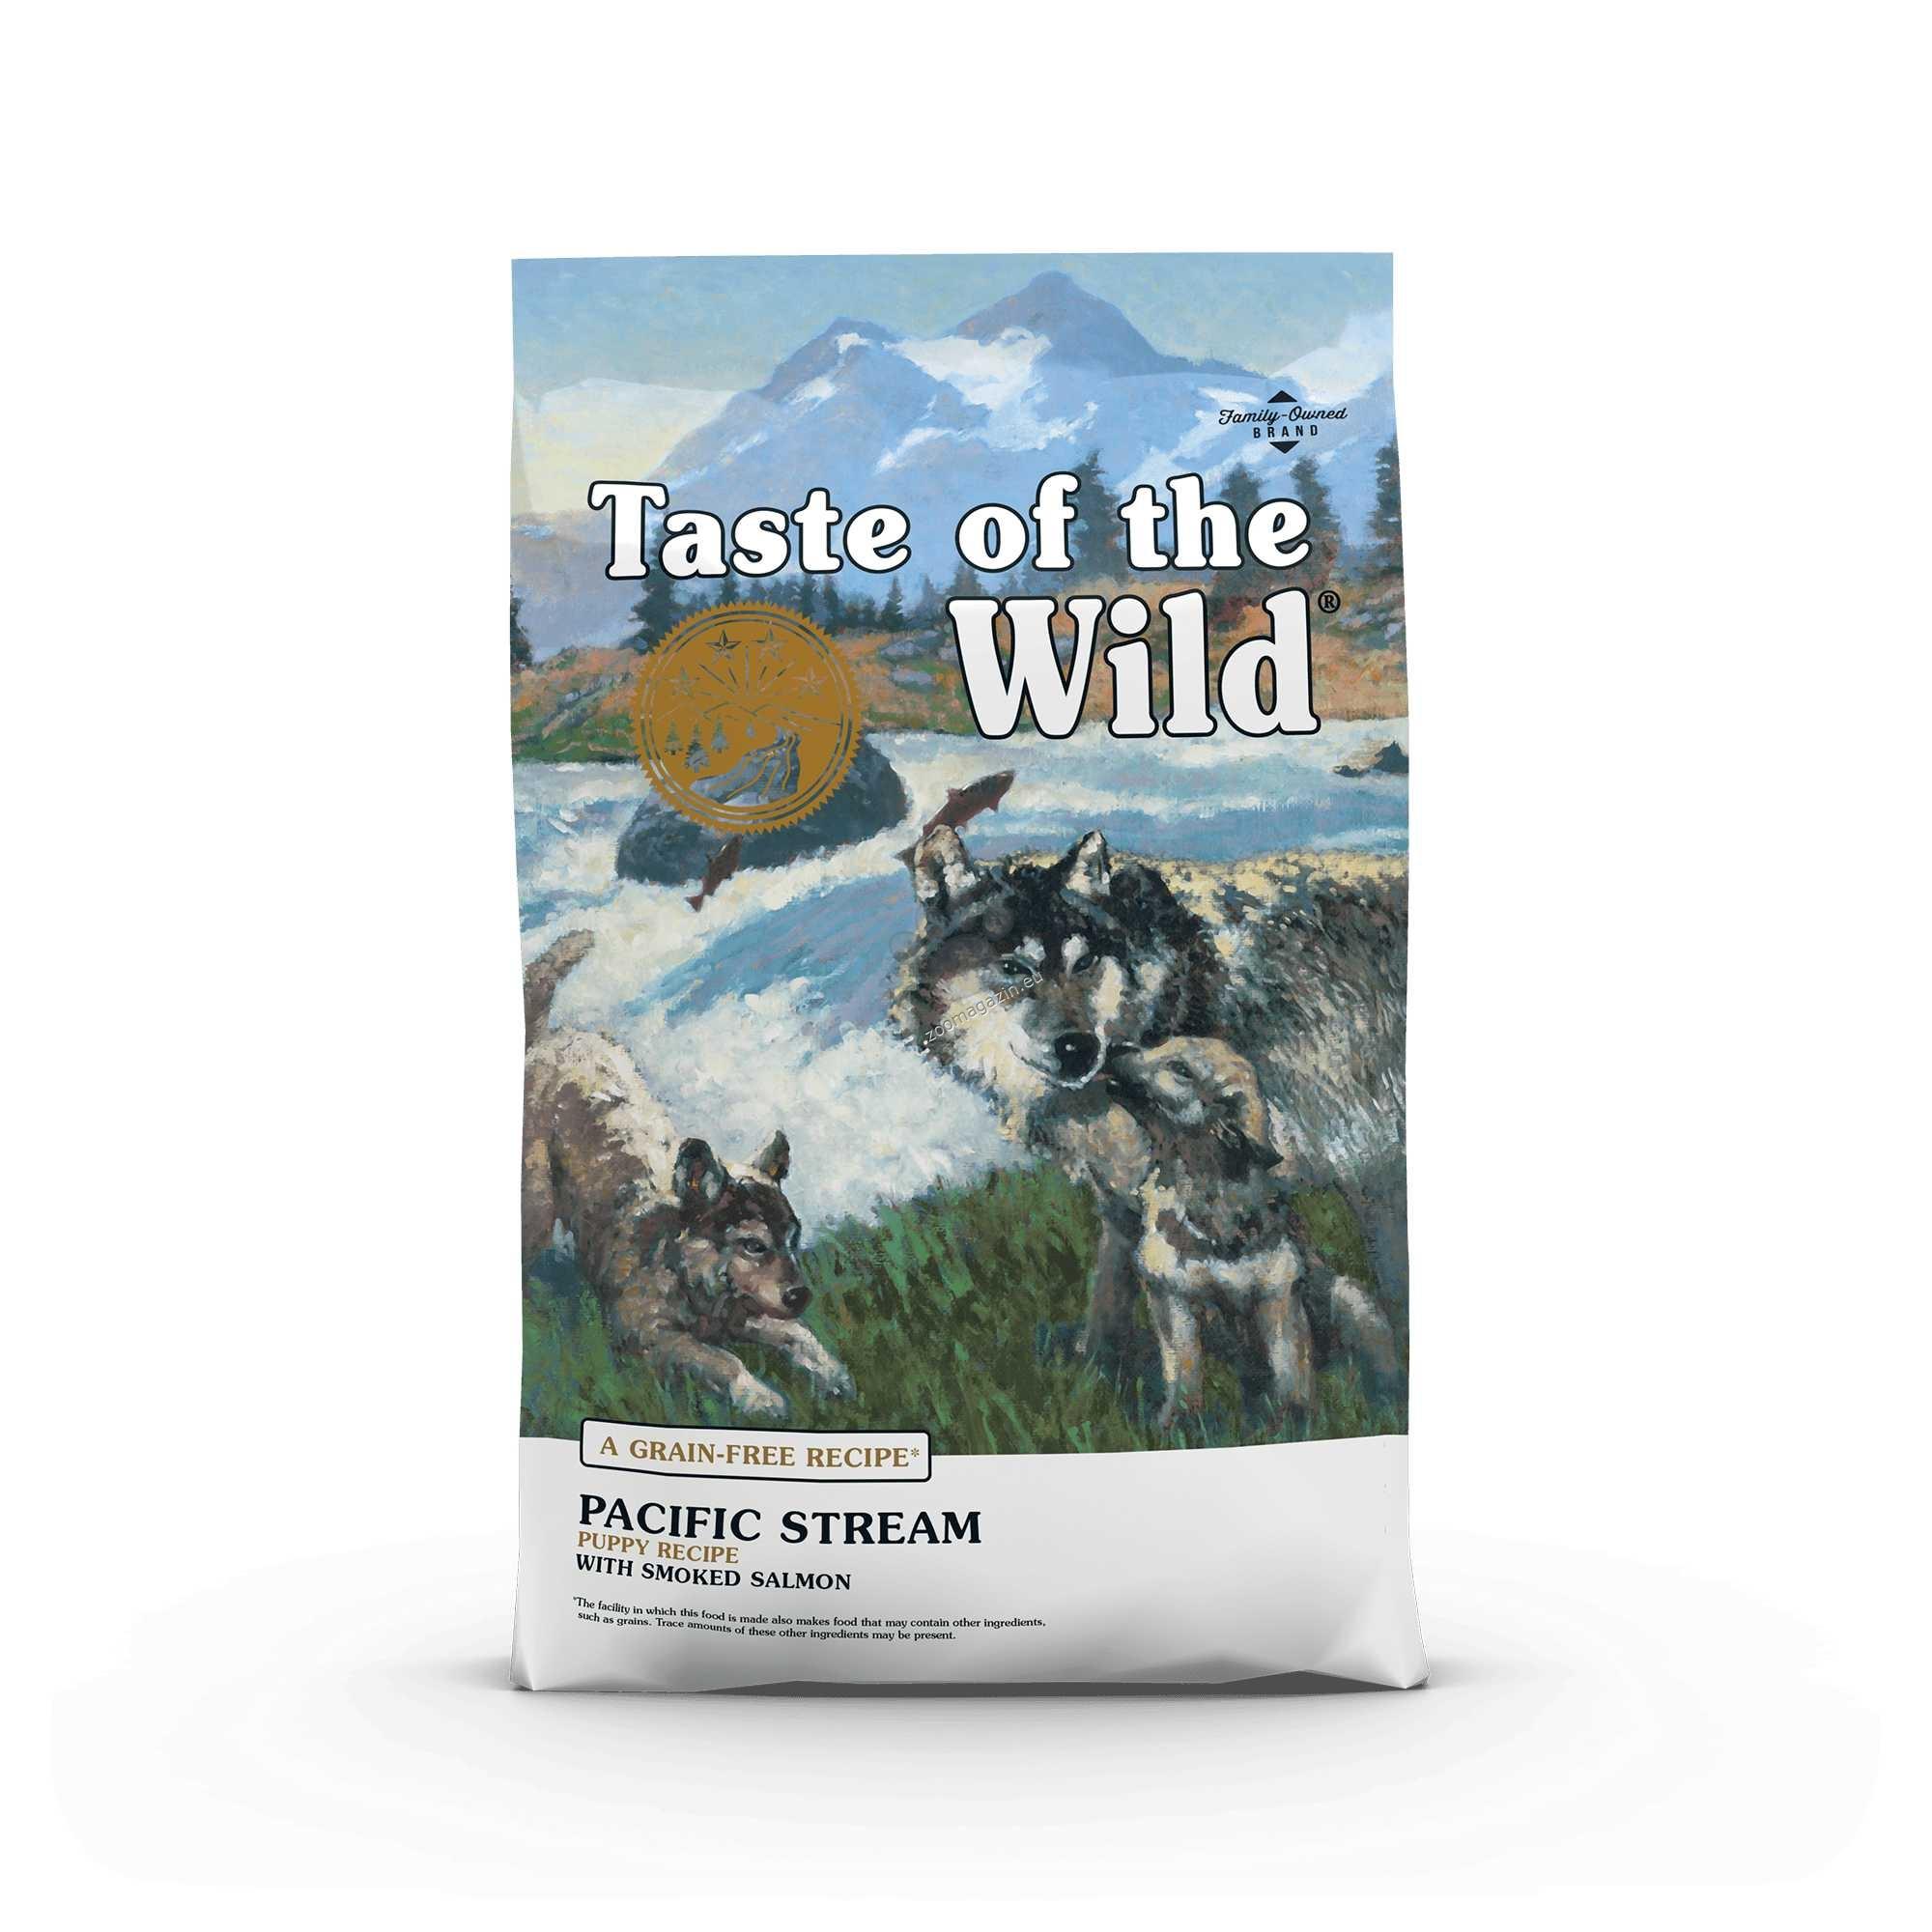 Taste of the Wild Pacific Stream Puppy with Smoked Salmon - храна с пушена сьомга, за малки и подрастващи кучета от 1 до 12 месеца 12.2 кг.